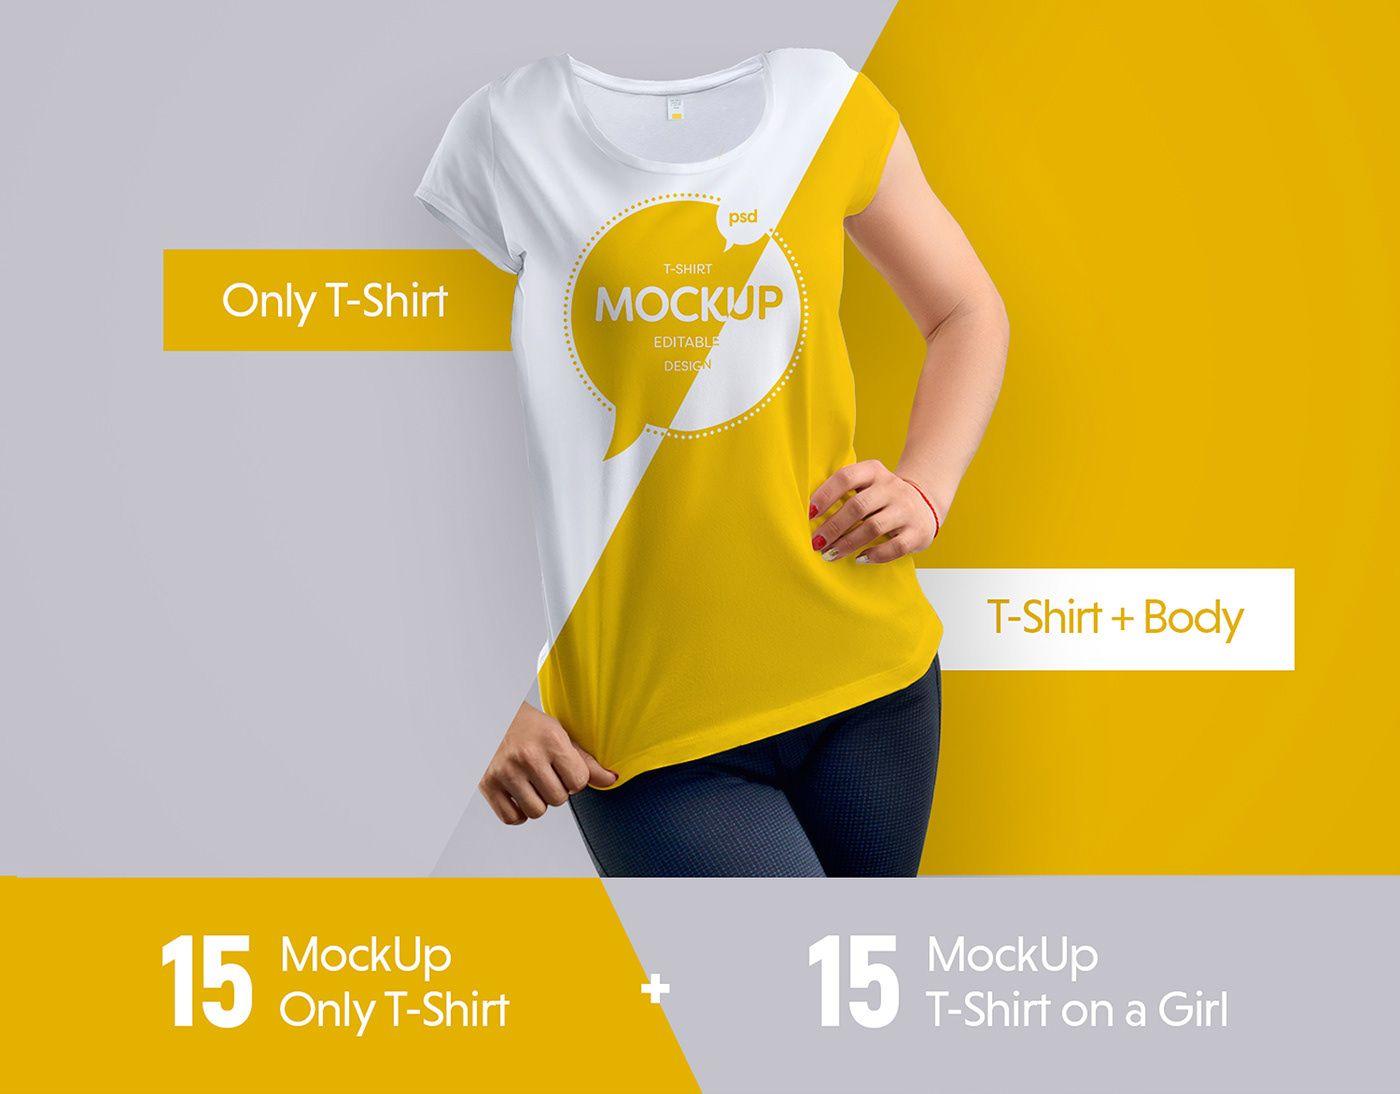 55 Free Clothing Accessories Psd Mockup Templates Free Psd Templates Shirt Mockup T Shirt Design Template Tshirt Mockup